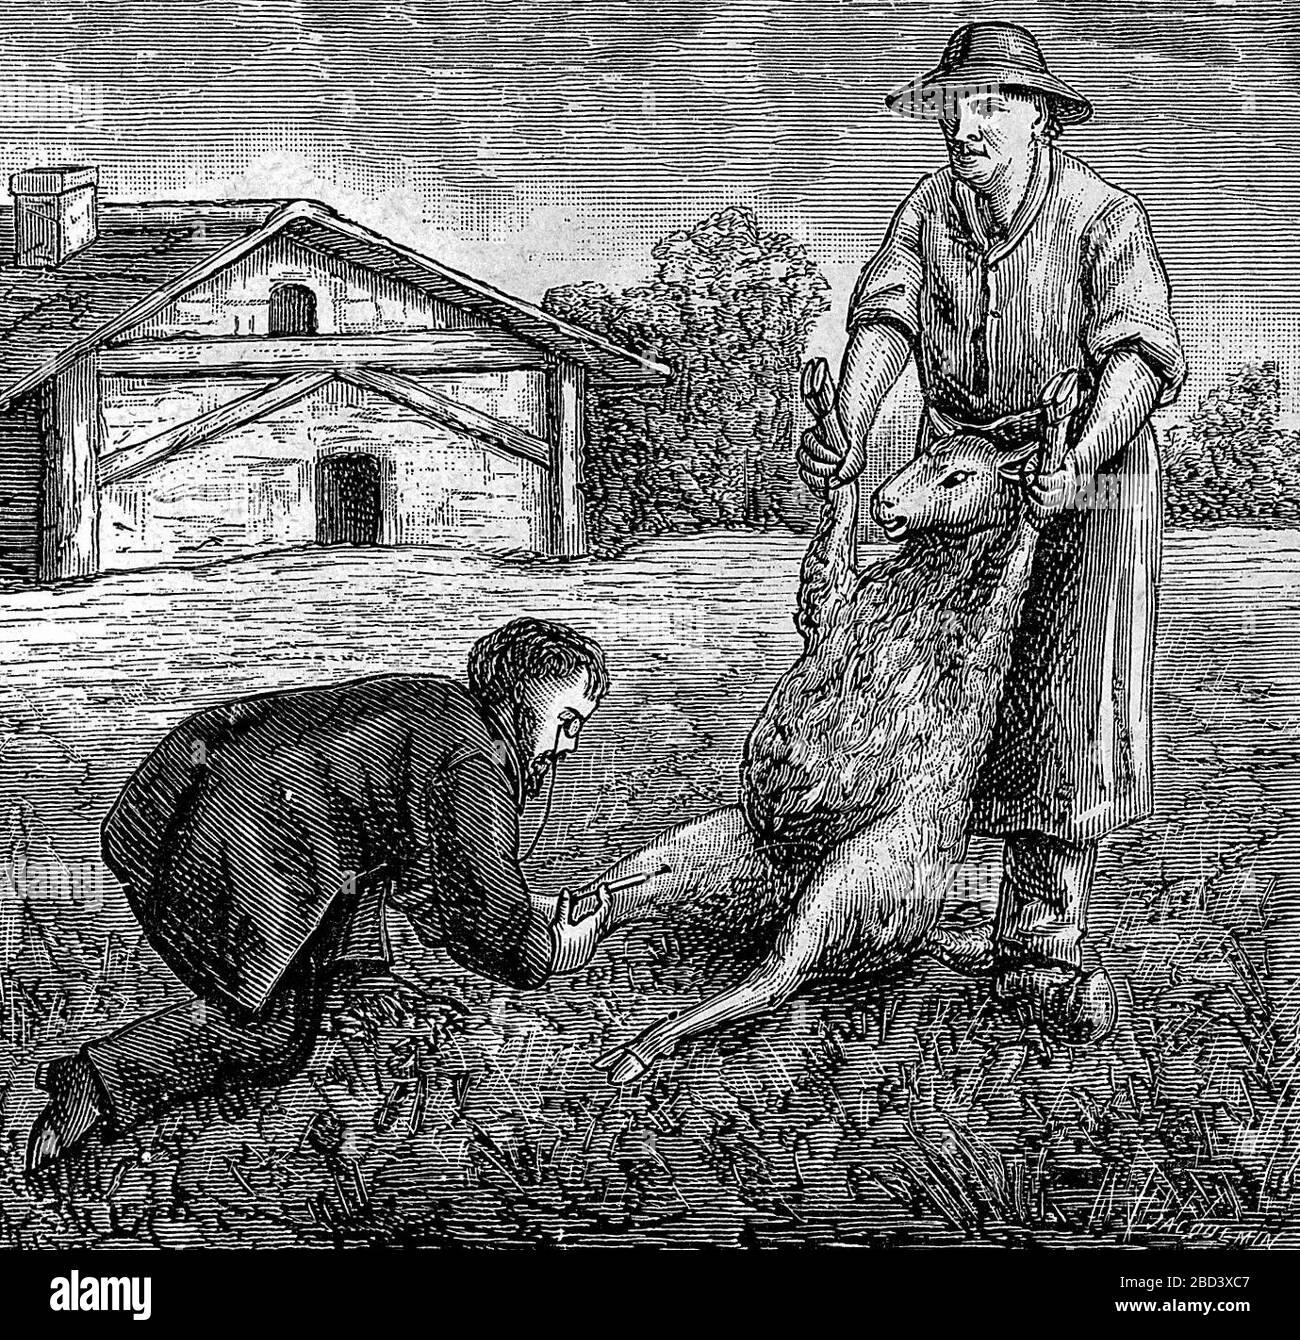 Louis Pasteur inoculating sheep against anthrax. Stock Photo